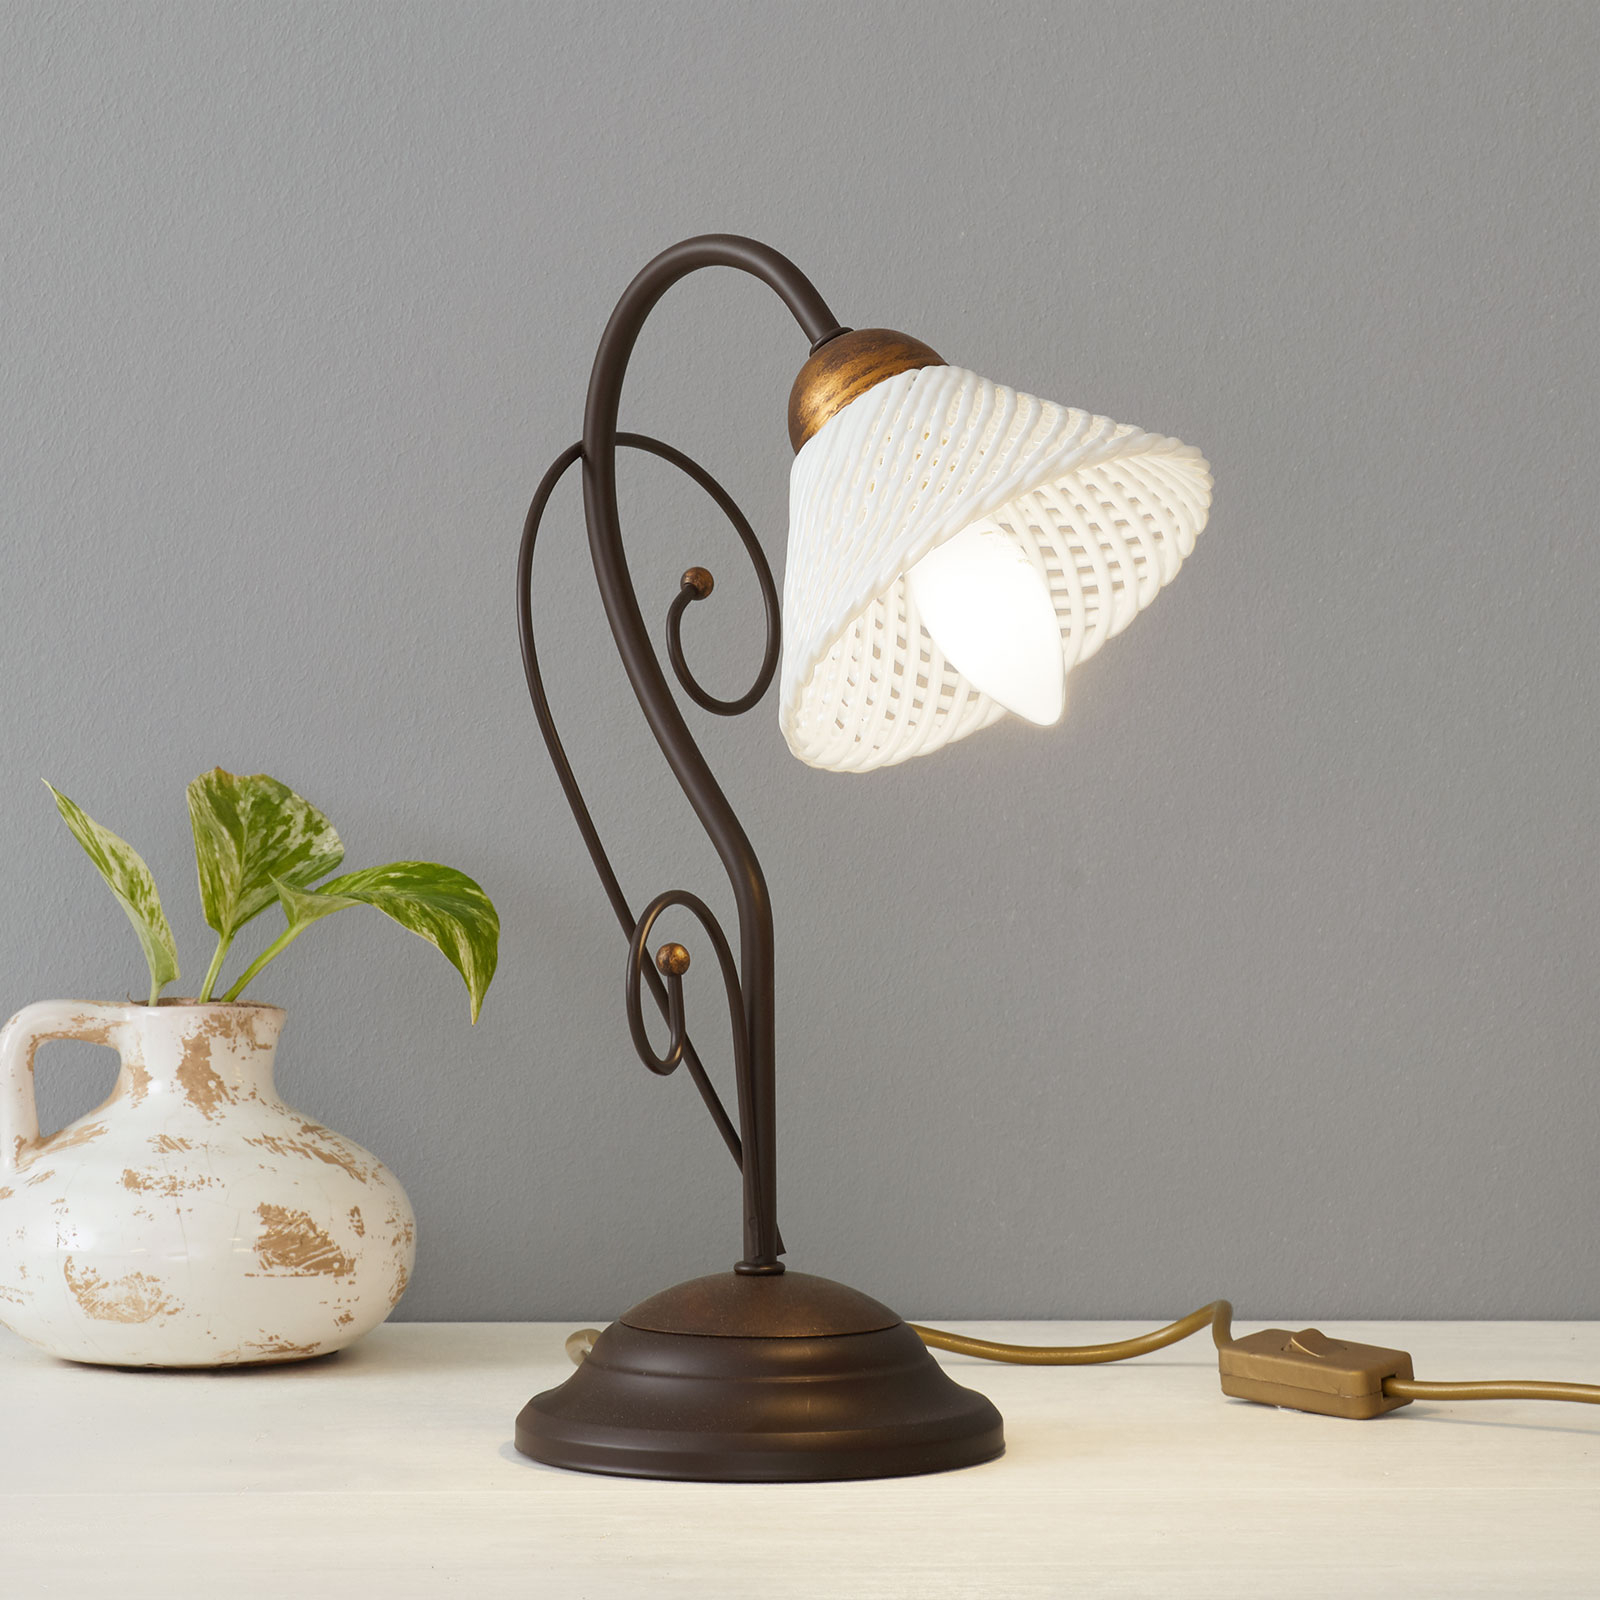 Très belle lampe à poser RETINA